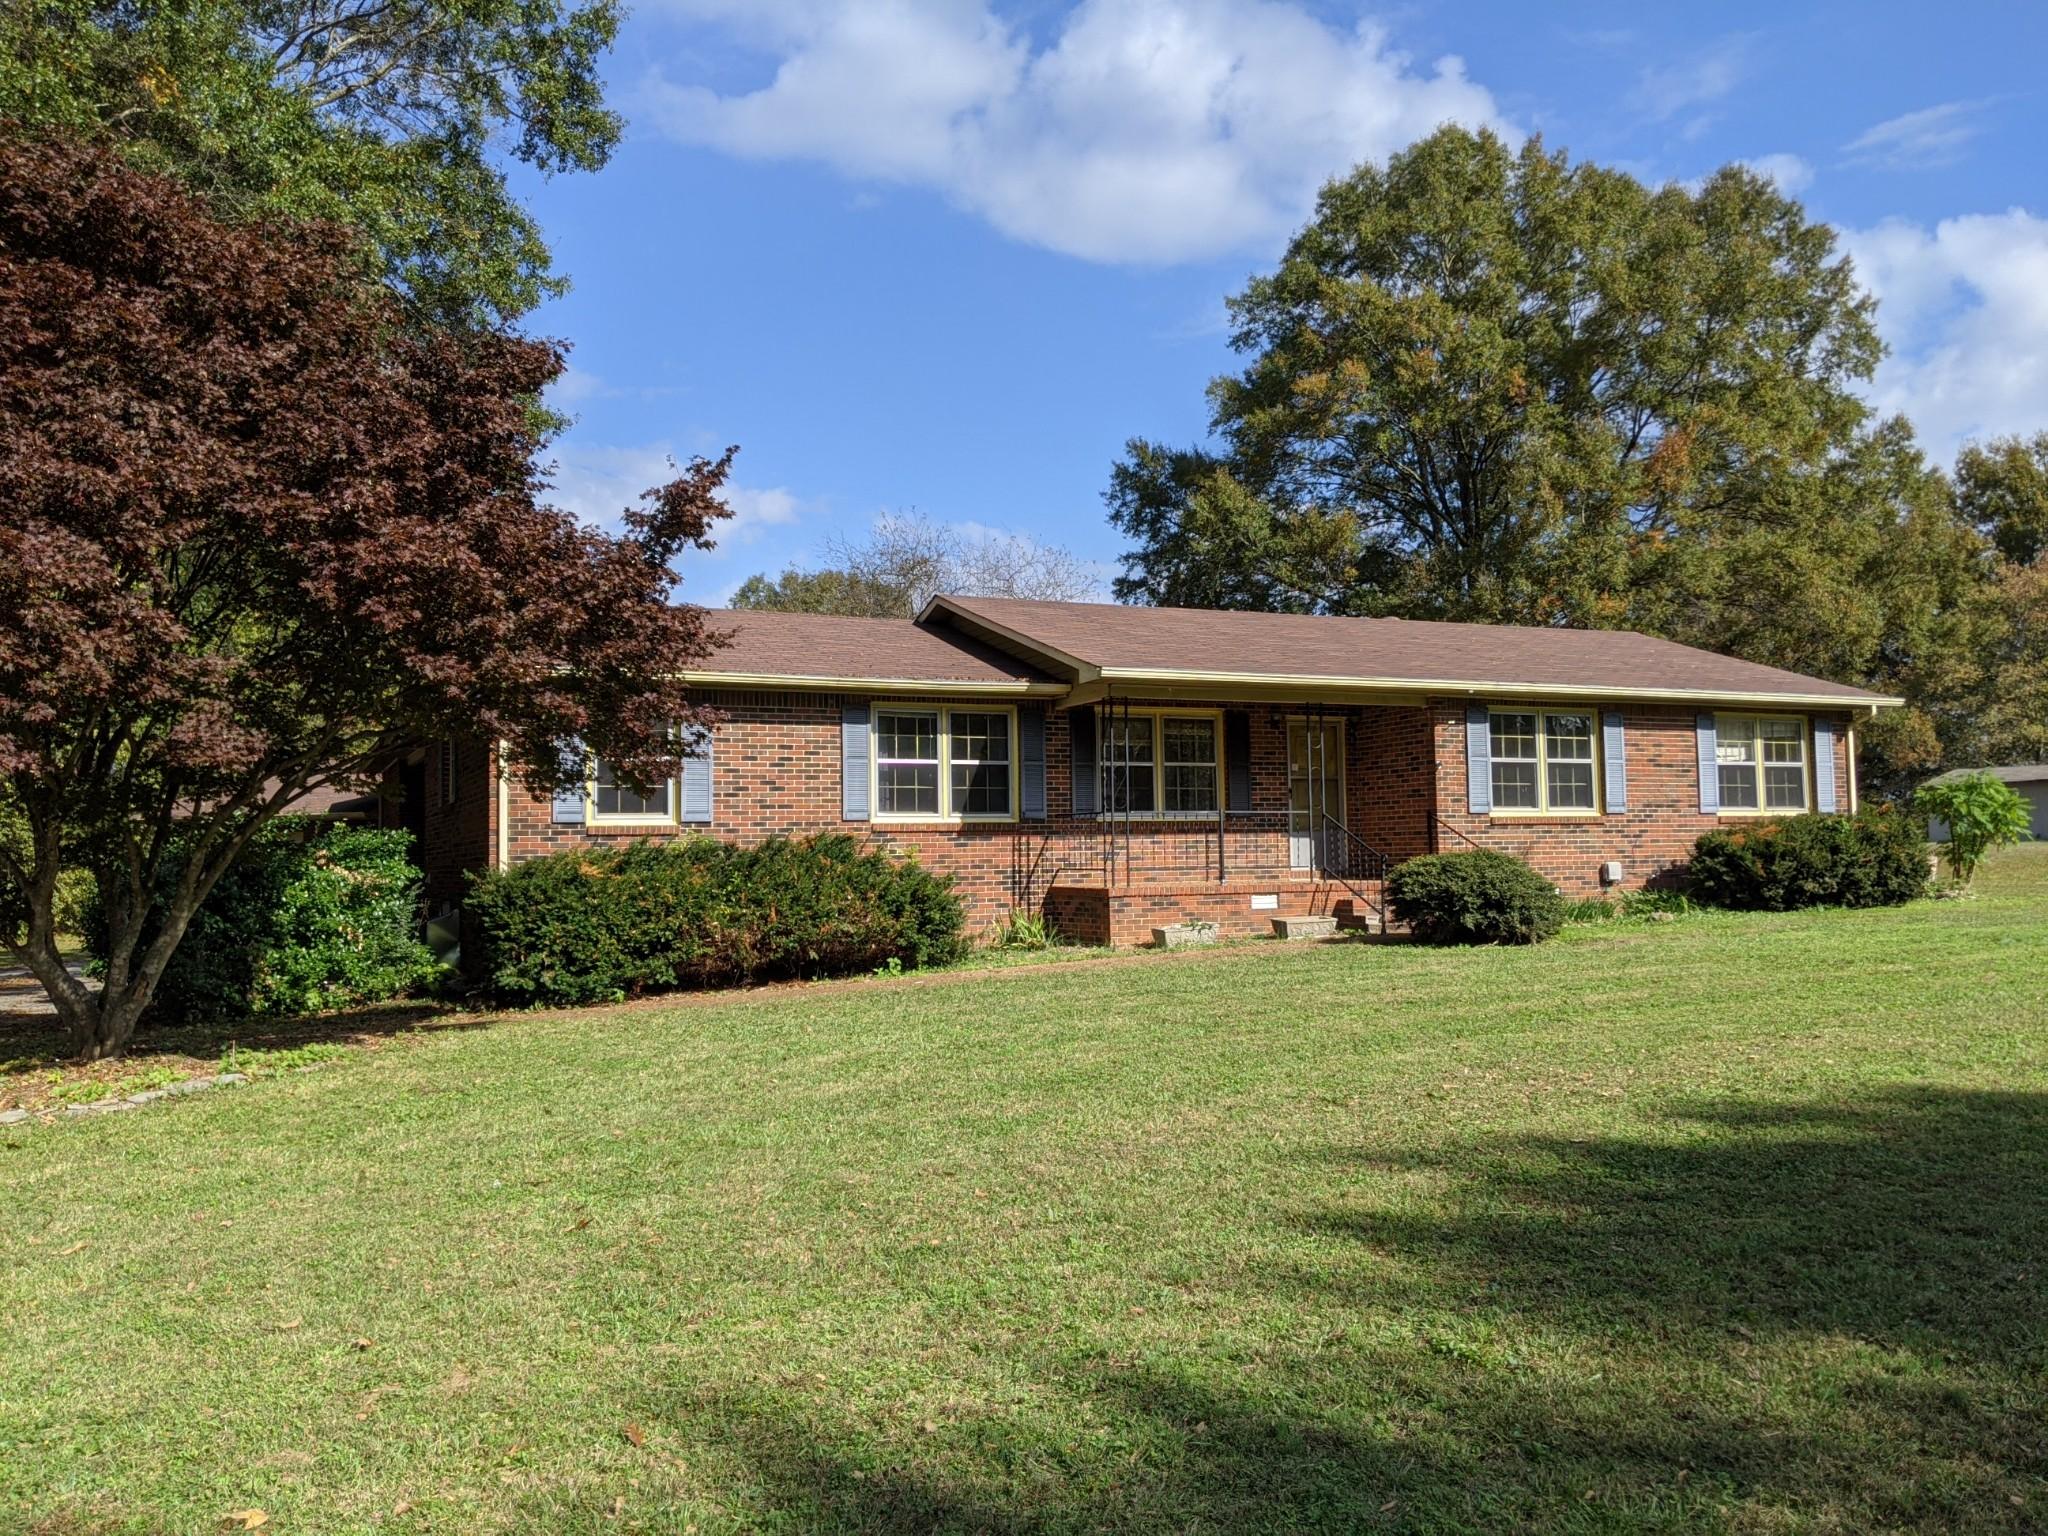 255 Carolyn Ct Property Photo - Hillsboro, TN real estate listing